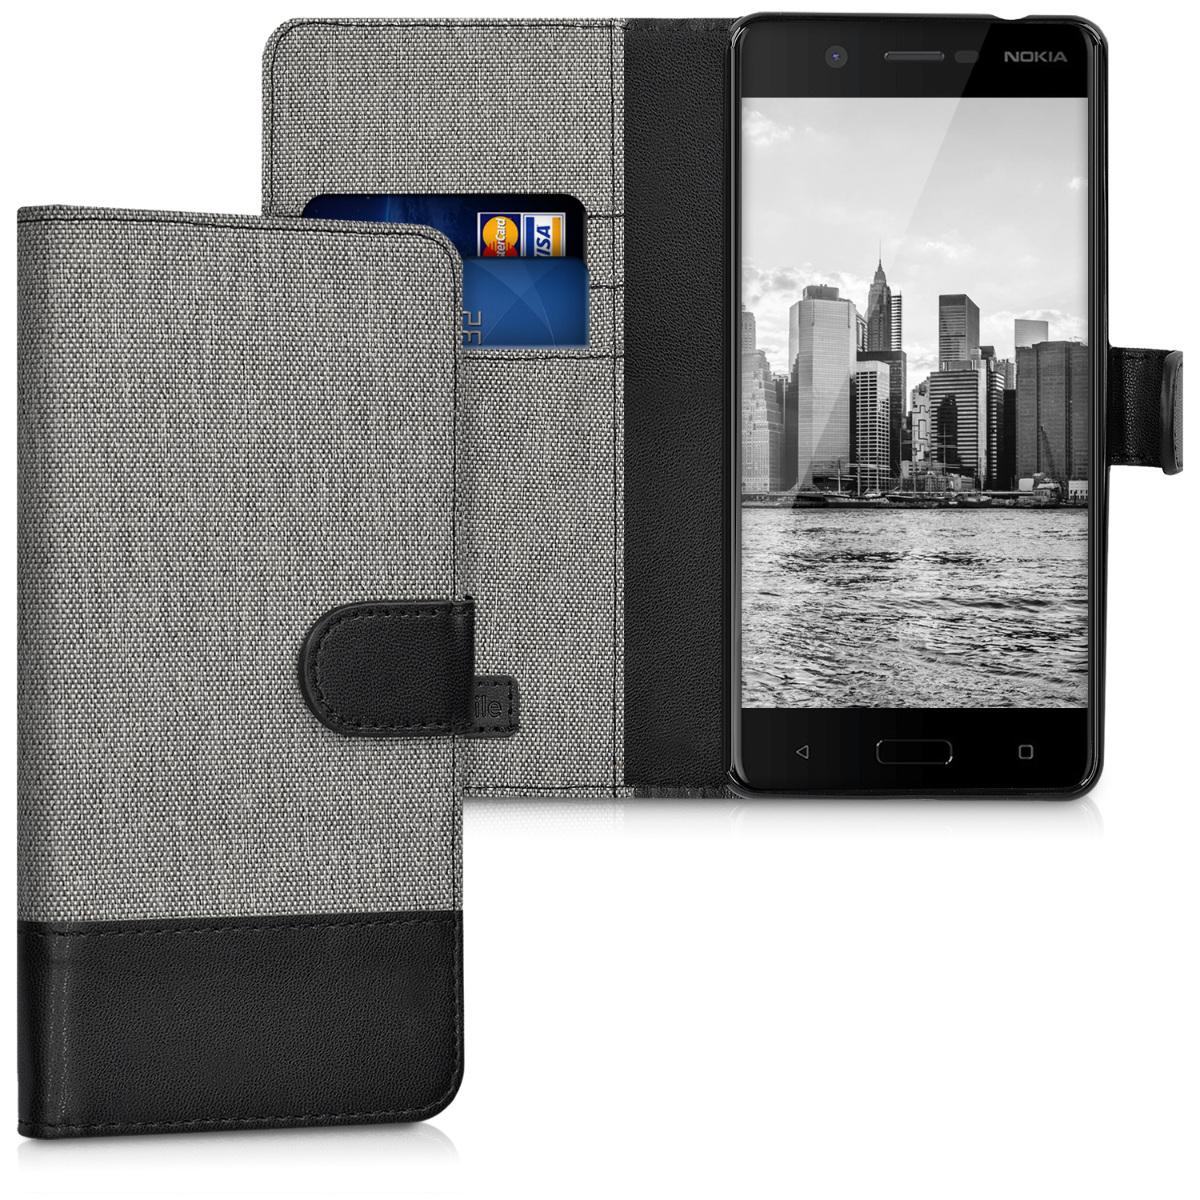 KW Θήκη Πορτοφόλι Nokia 5 - Grey / Black (41113.01)